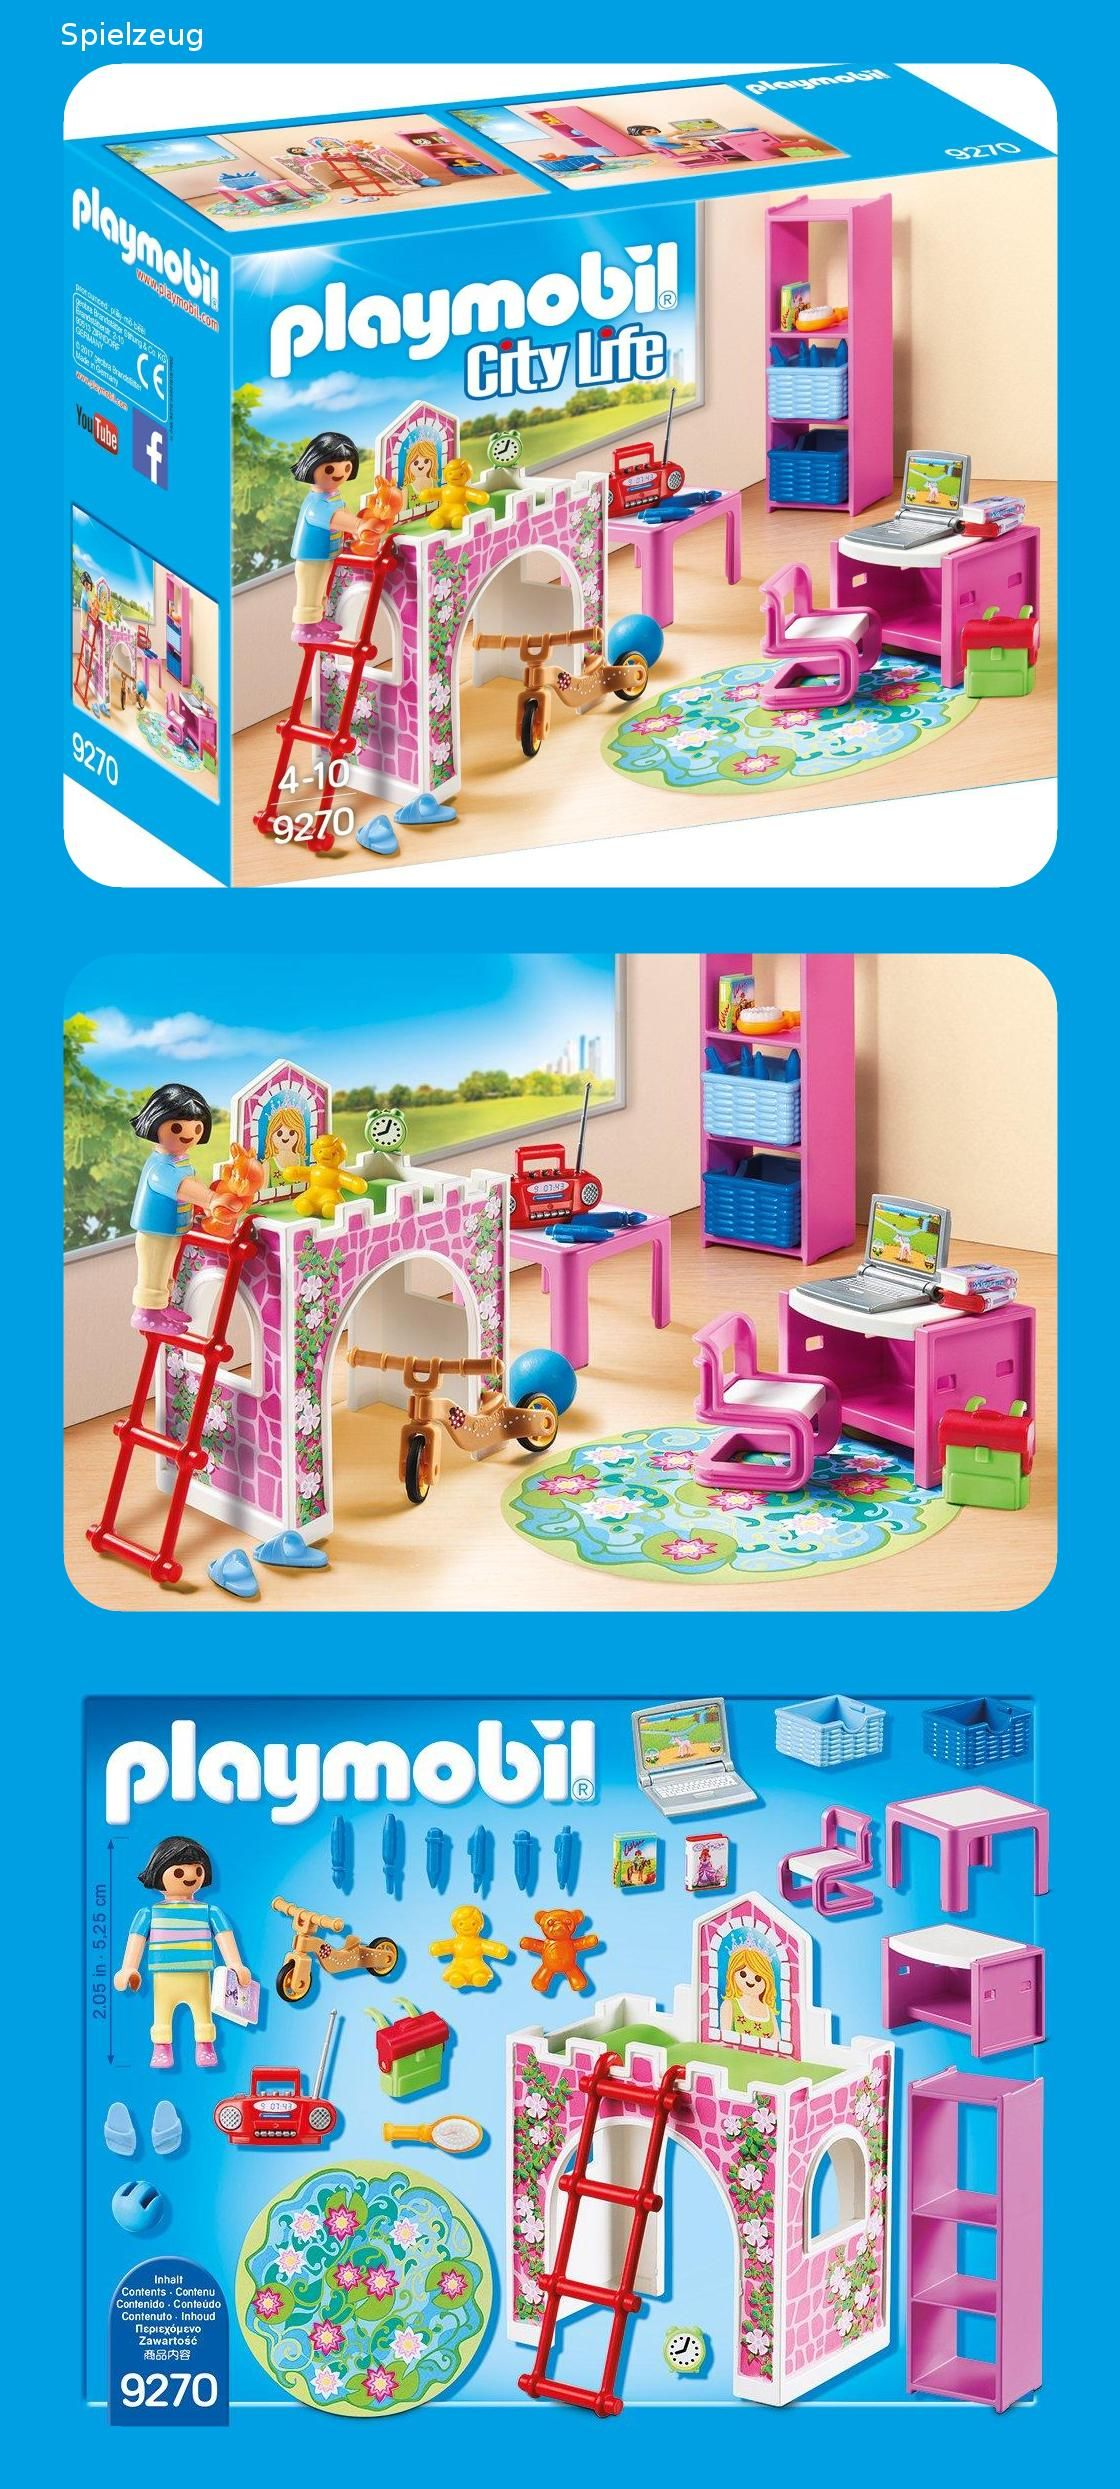 Playmobil 9270 - Fröhliches Kinderzimmer | Spielzeug ...